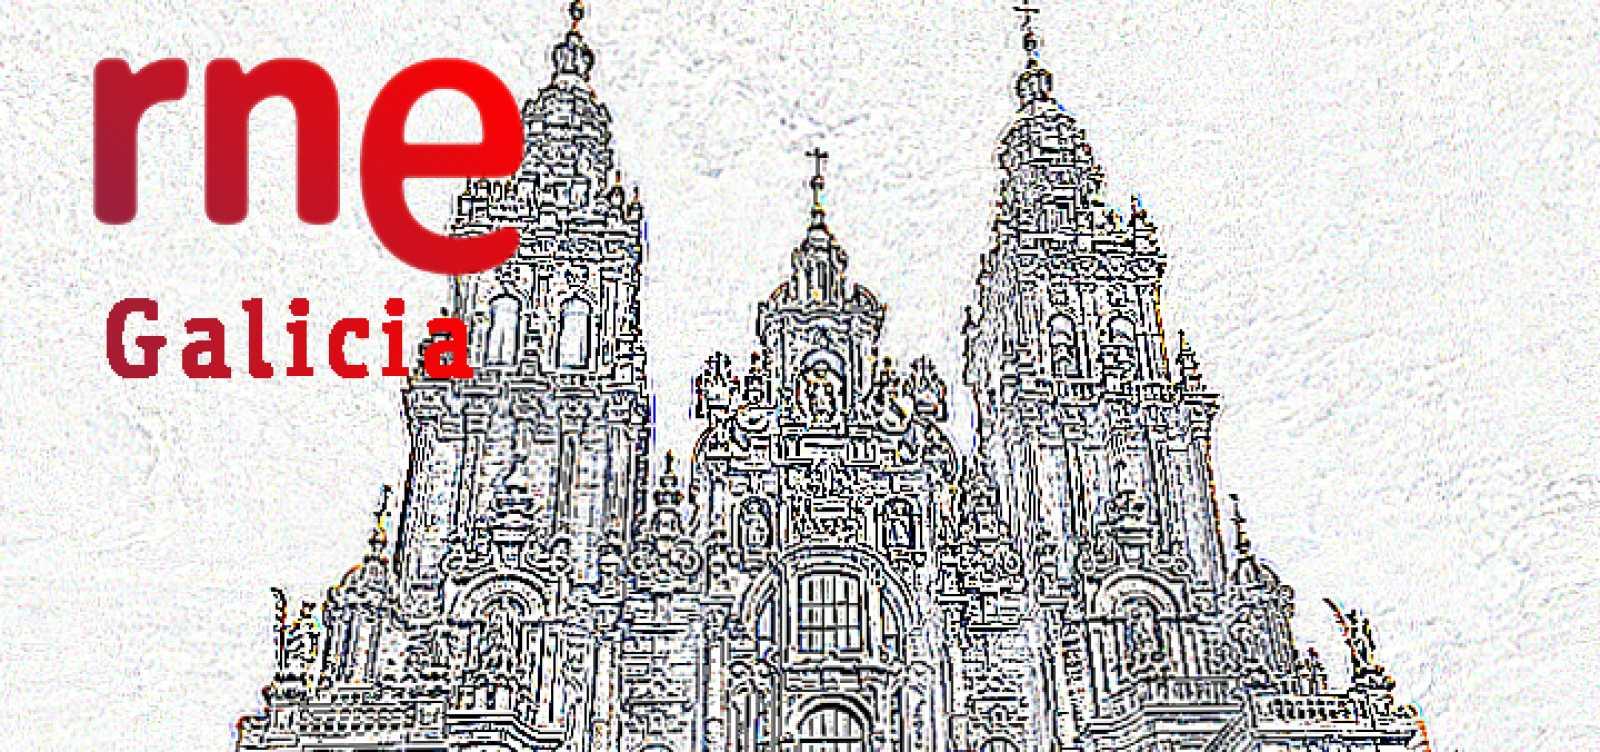 Crónica de Galicia - 16/05/2021. Escuchar ahora